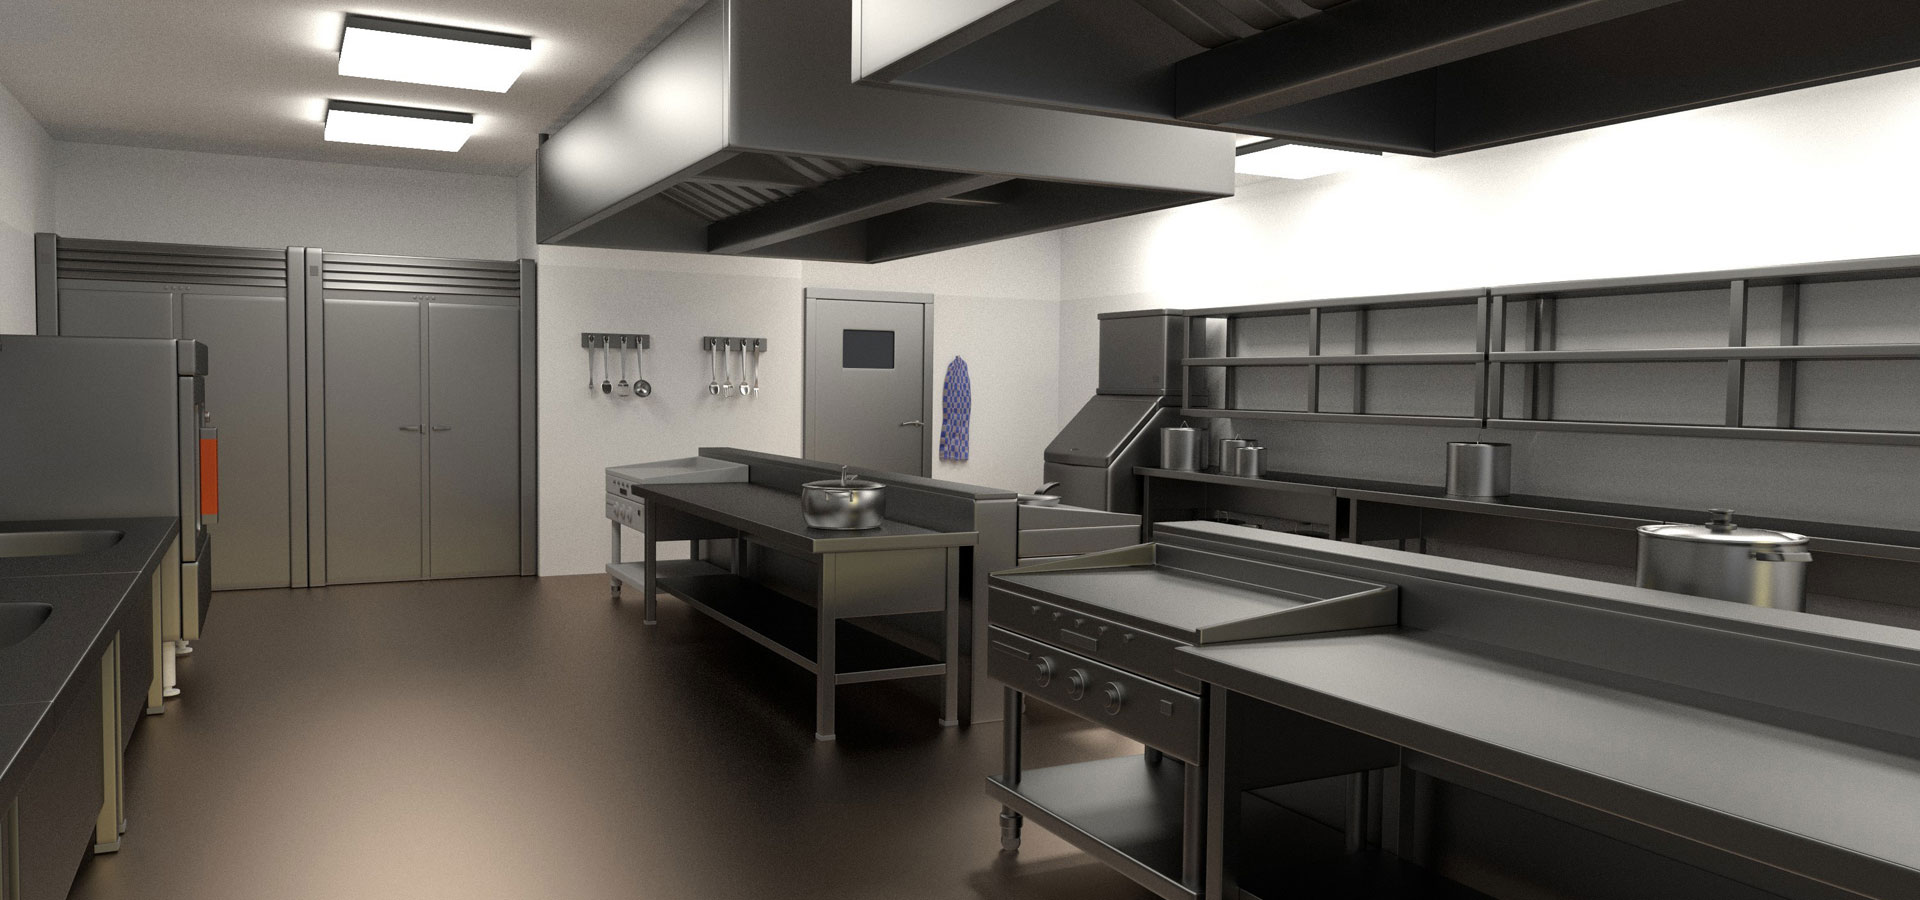 balzac-froid-cuisines-professionnelles